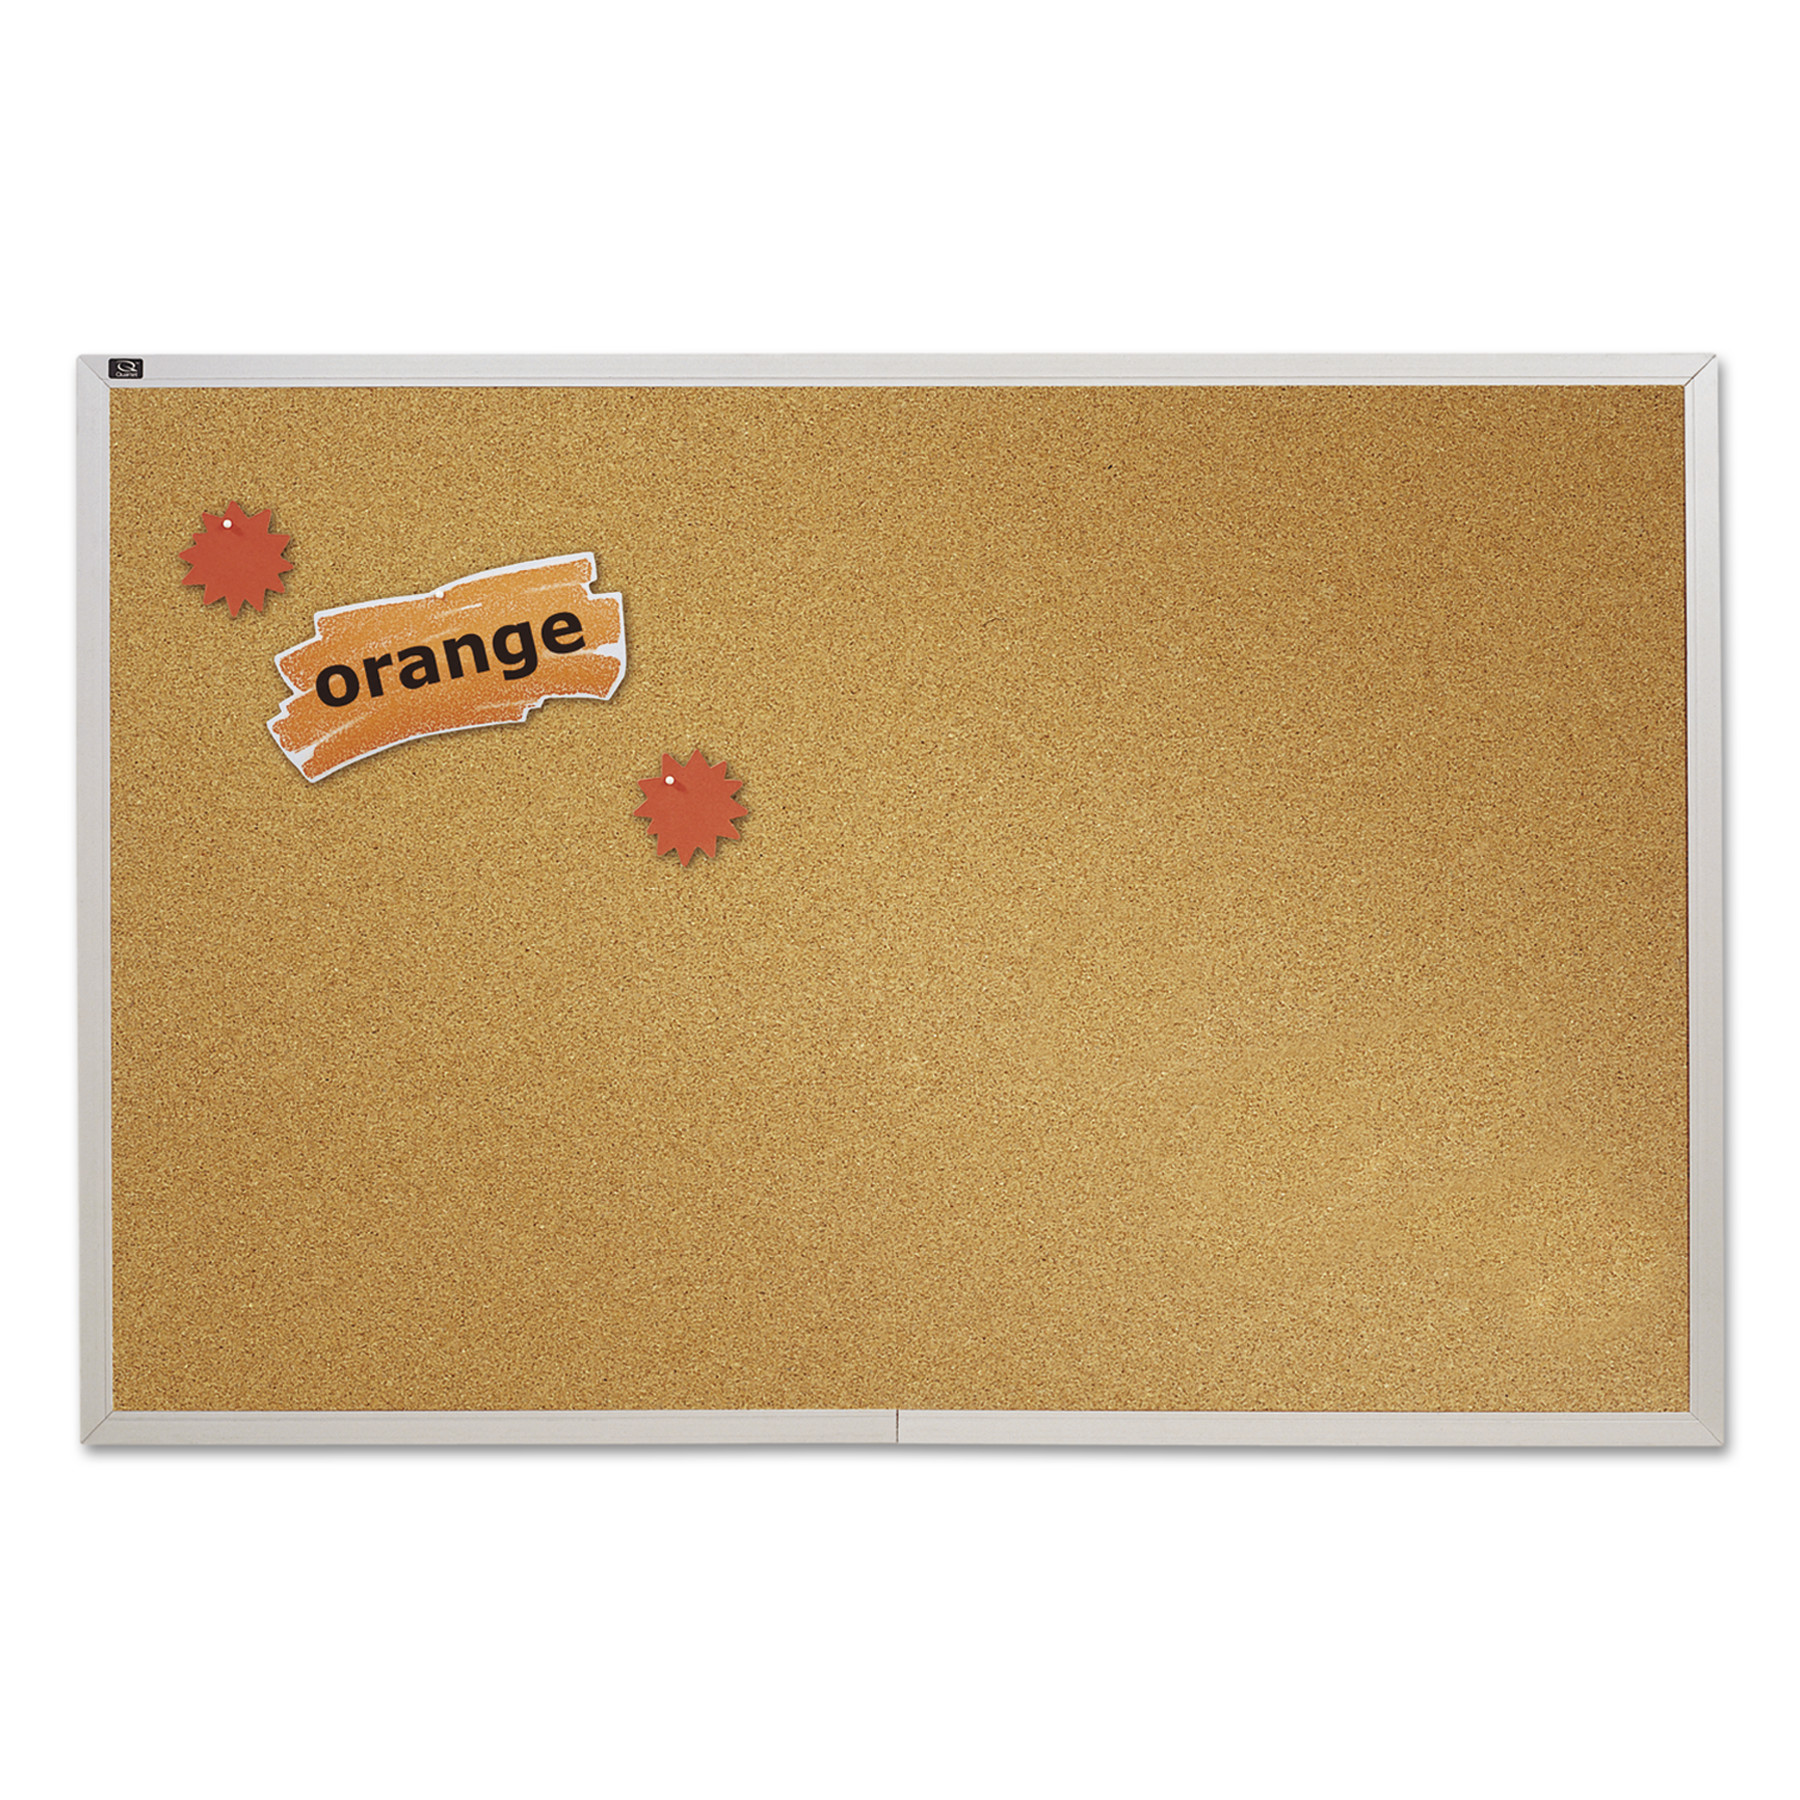 Quartet Natural Cork Bulletin Board, 72 x 48, Anodized Aluminum Frame